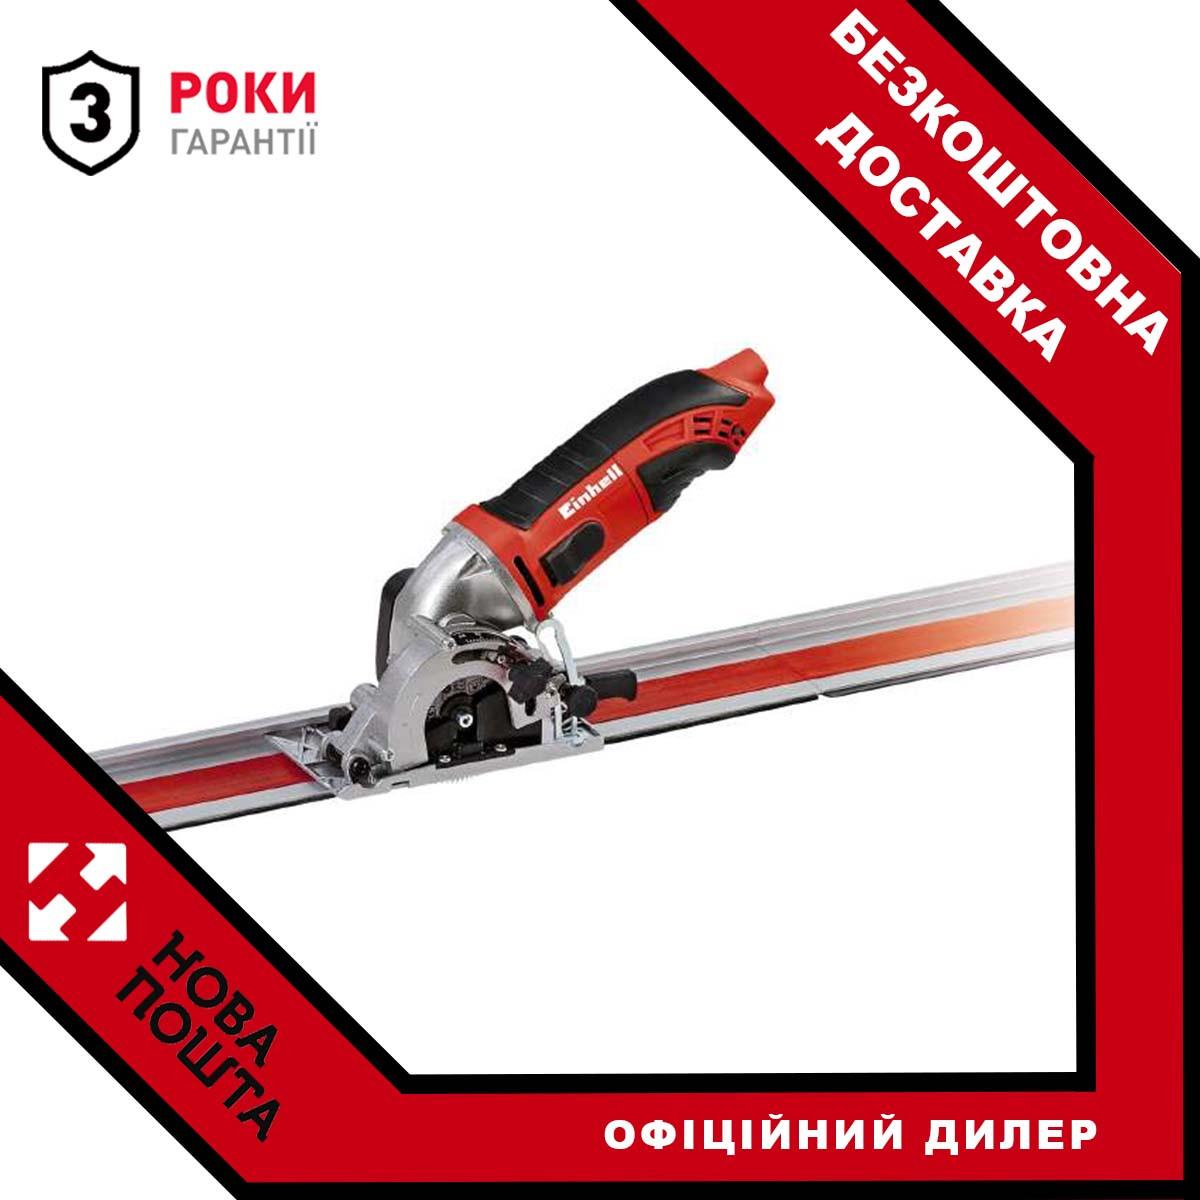 Пила универсальная Einhell TC-CS 860/1 Kit New